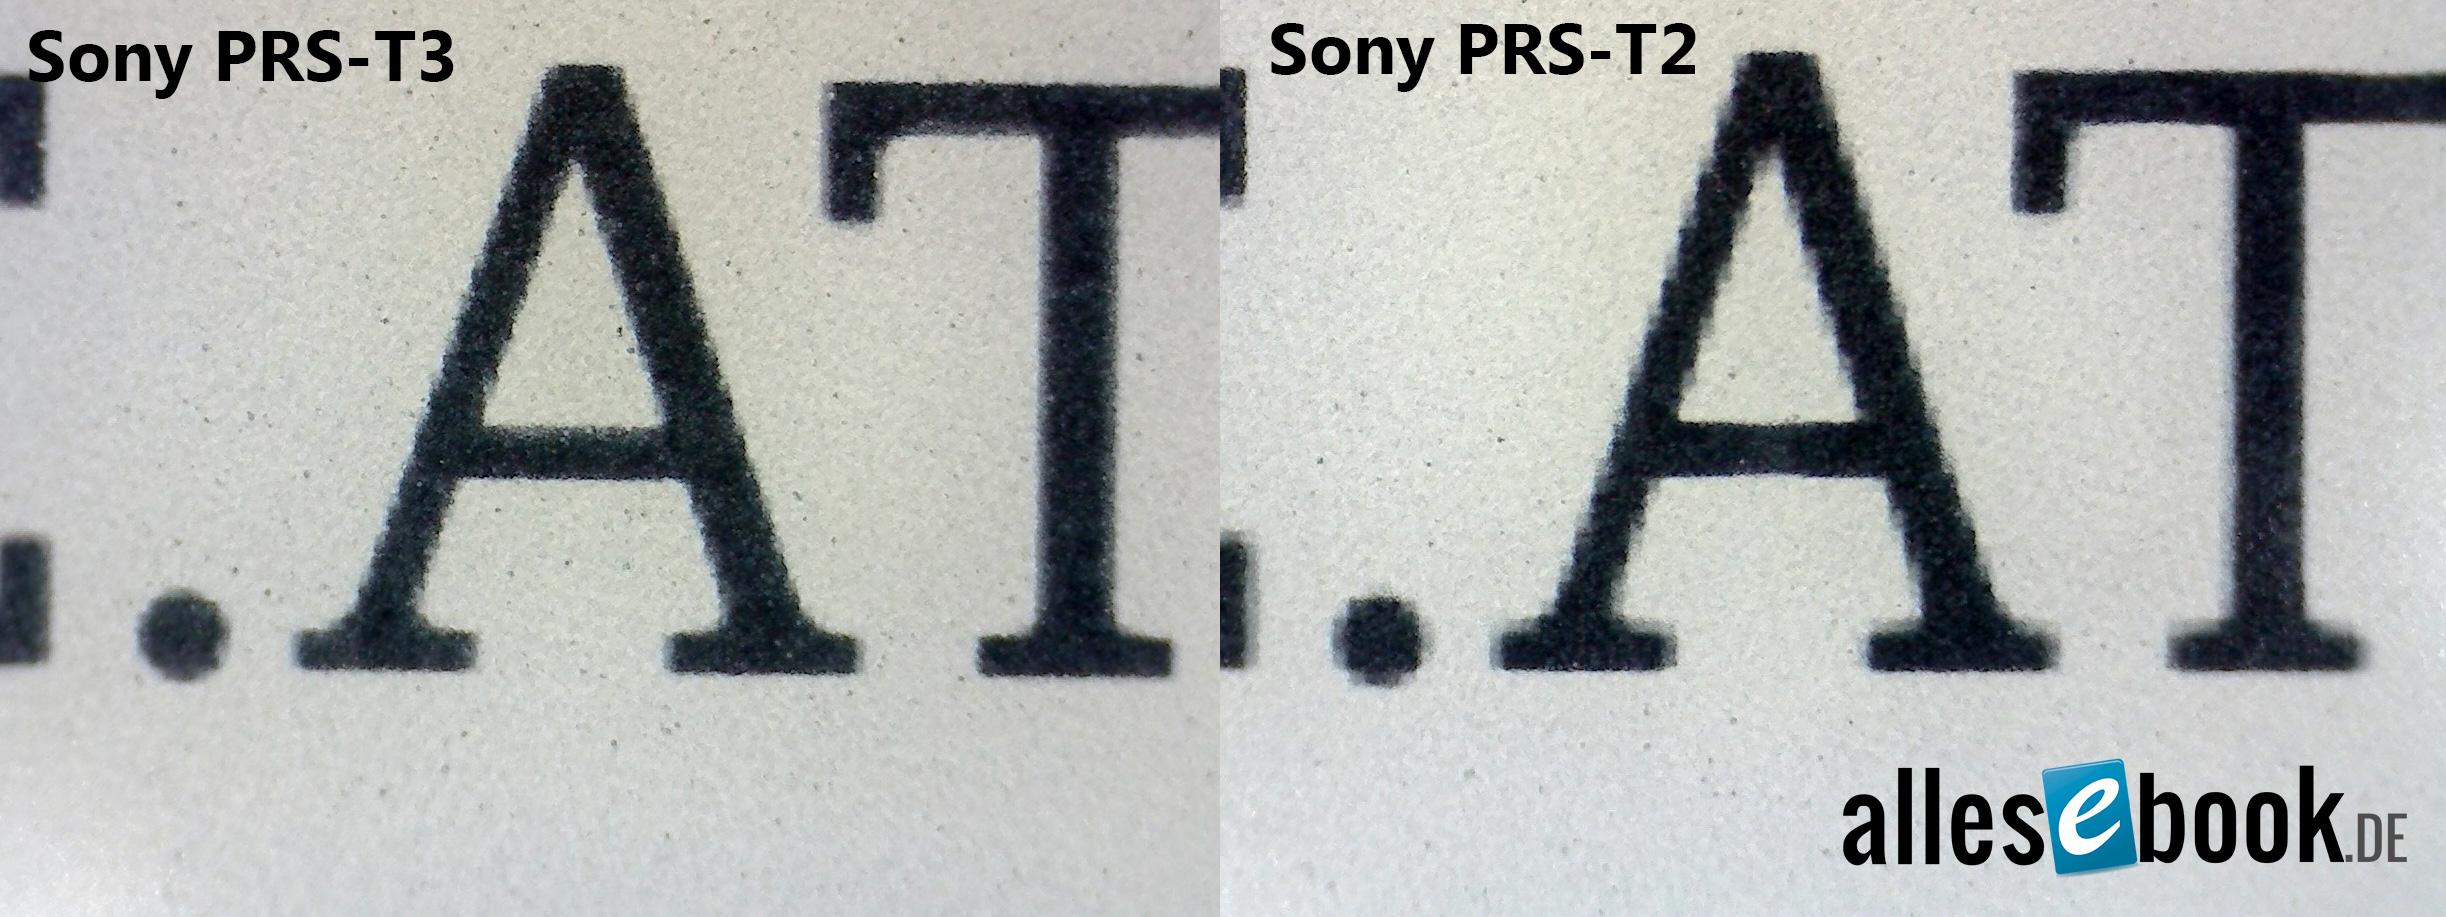 Kindle Vs Sony Reader: Alle Infos Zum Sony PRS-T3